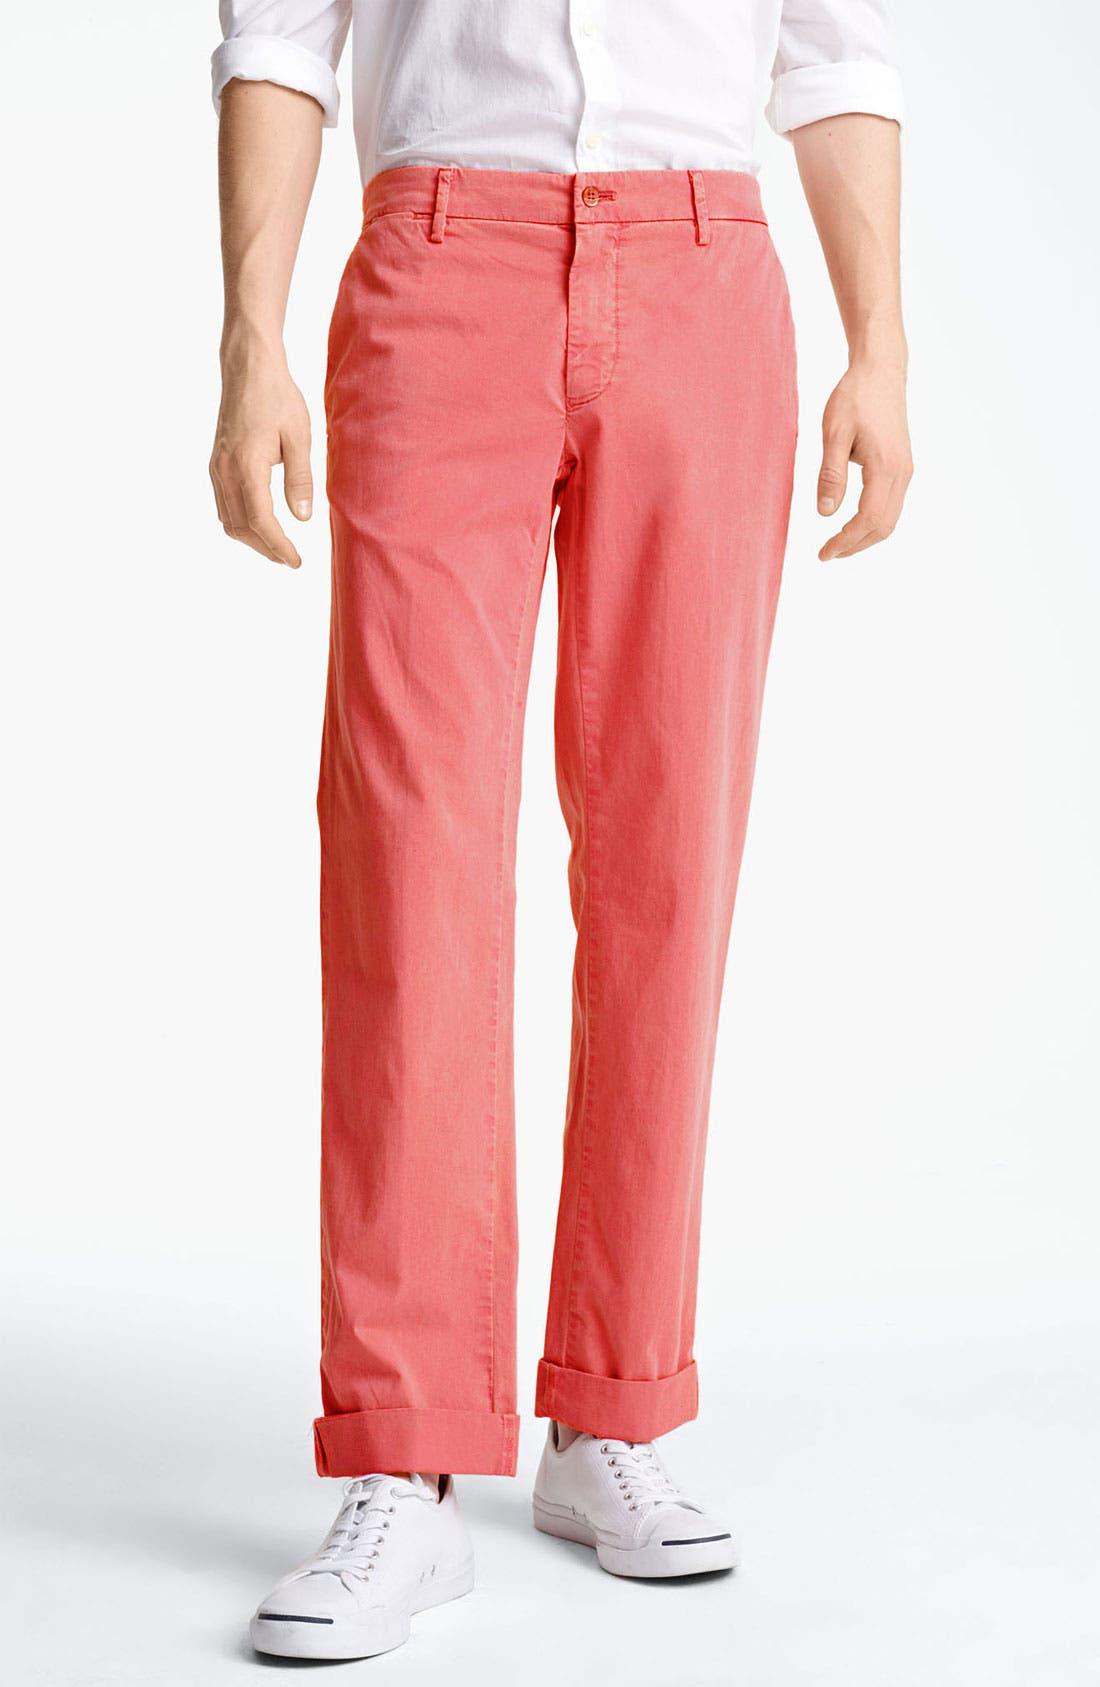 Main Image - Mason's New York Fit Cotton Chinos